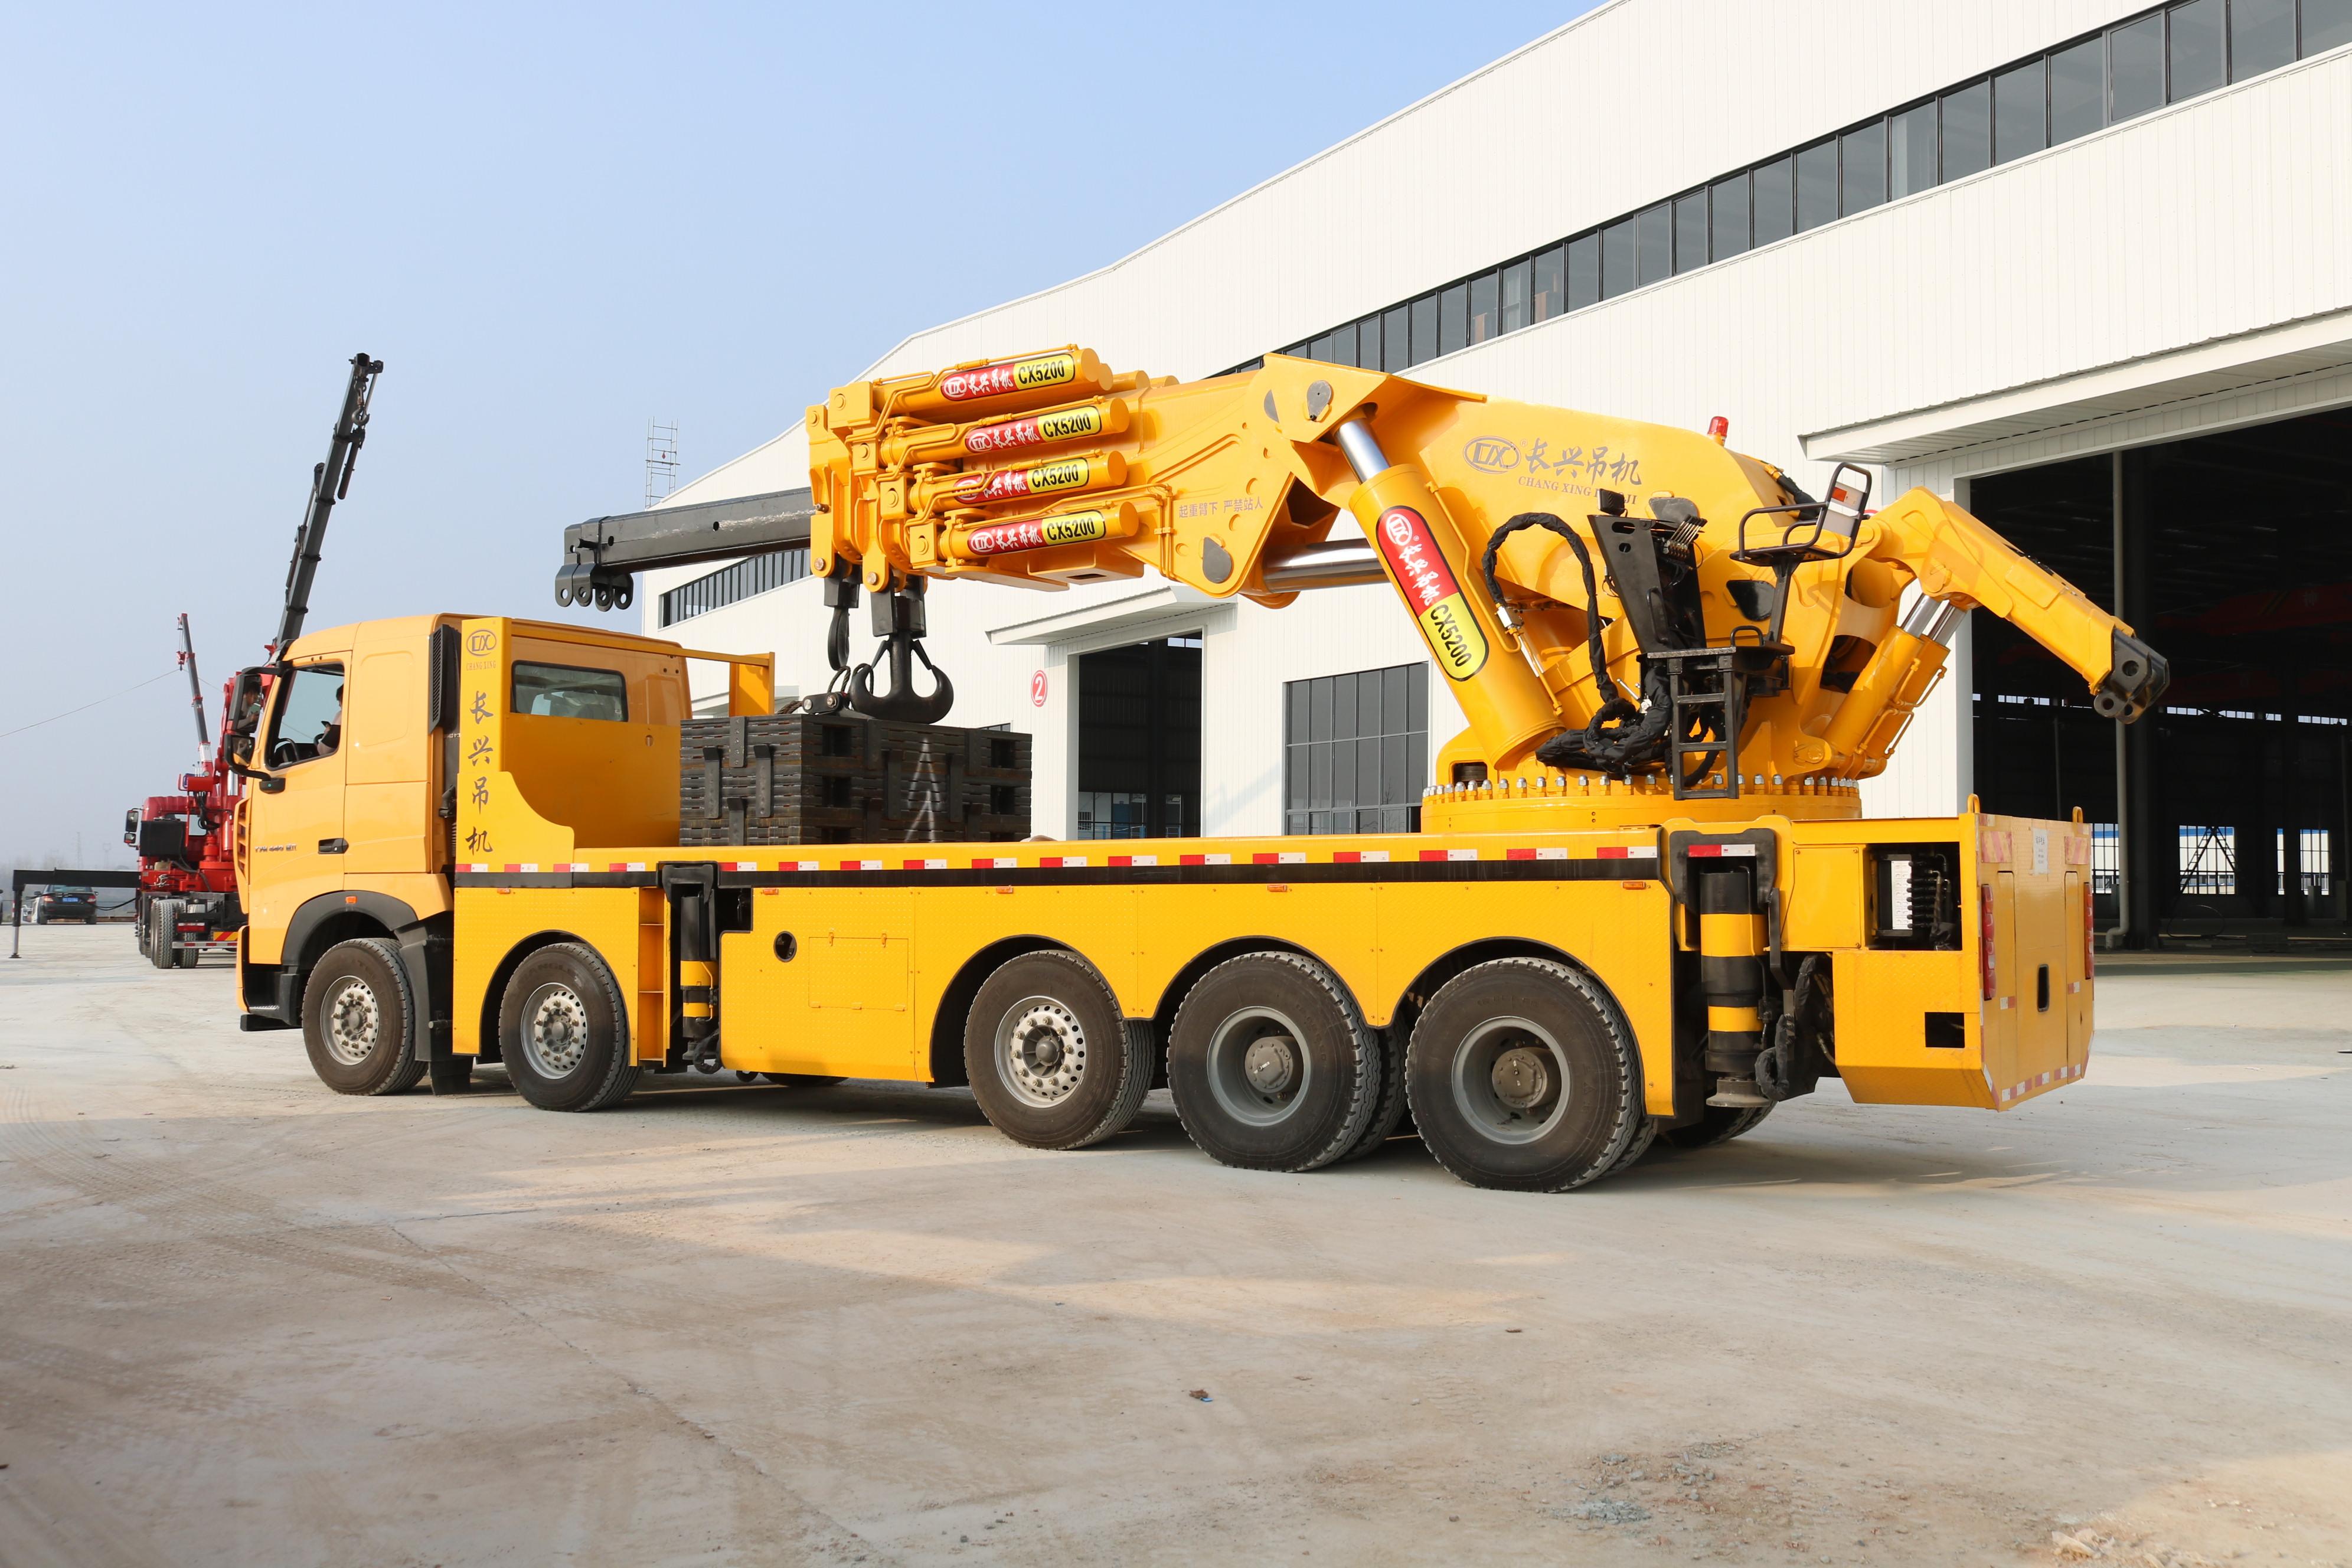 SQZ5200(4米吊130吨)汽车起重机全方位高清图展示